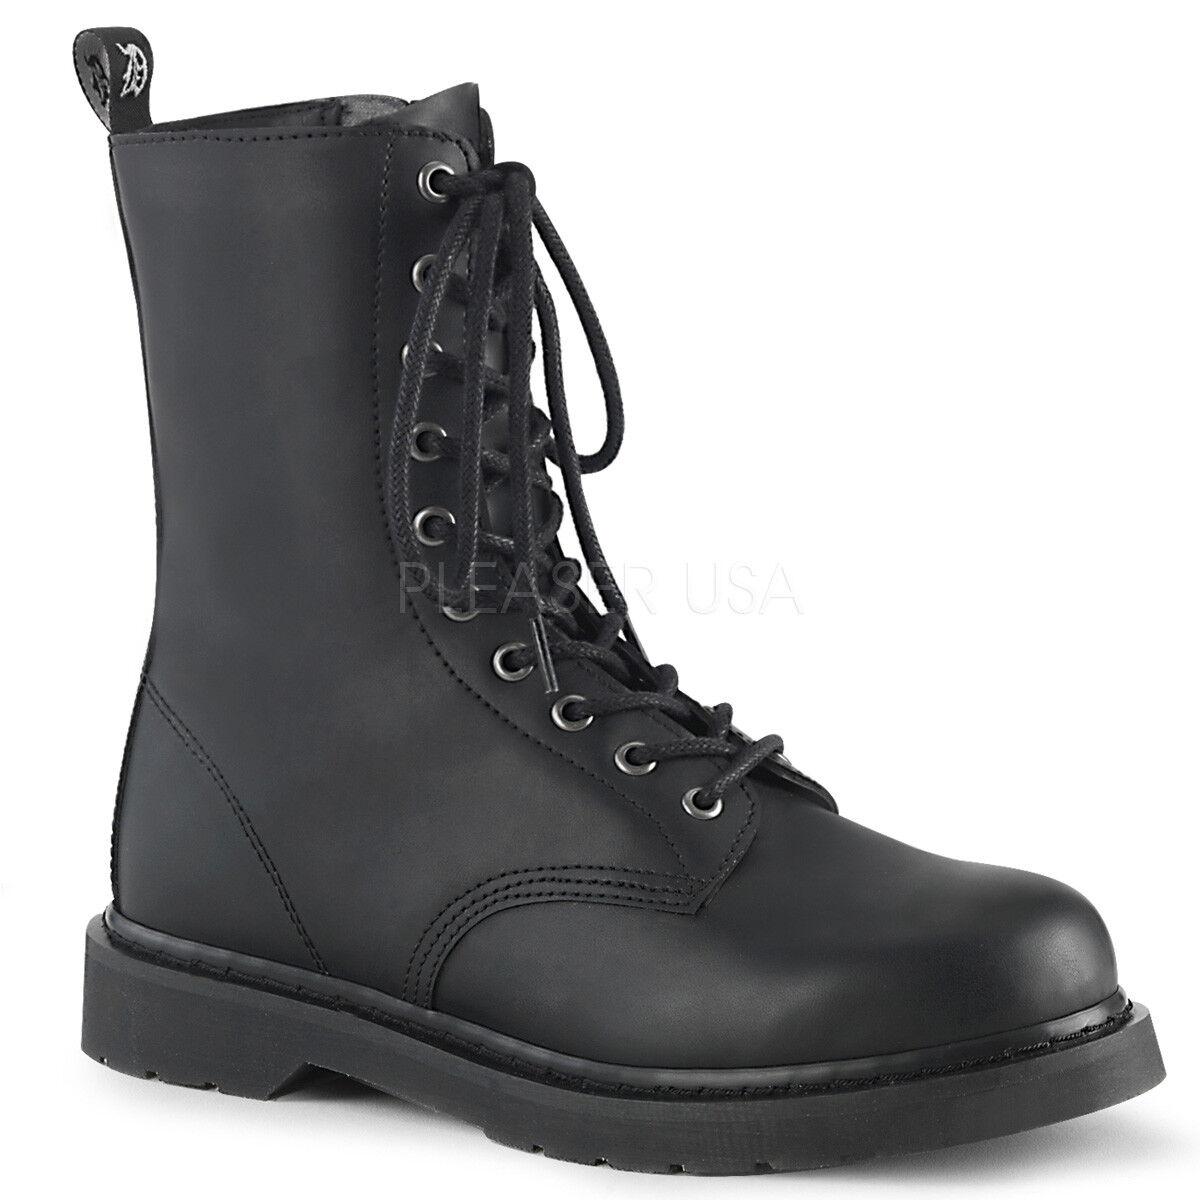 DEMONIA Mens Punk Goth Military Biker Combat Heel 10  Eyeelet nero Mid Calf stivali  memorizzare